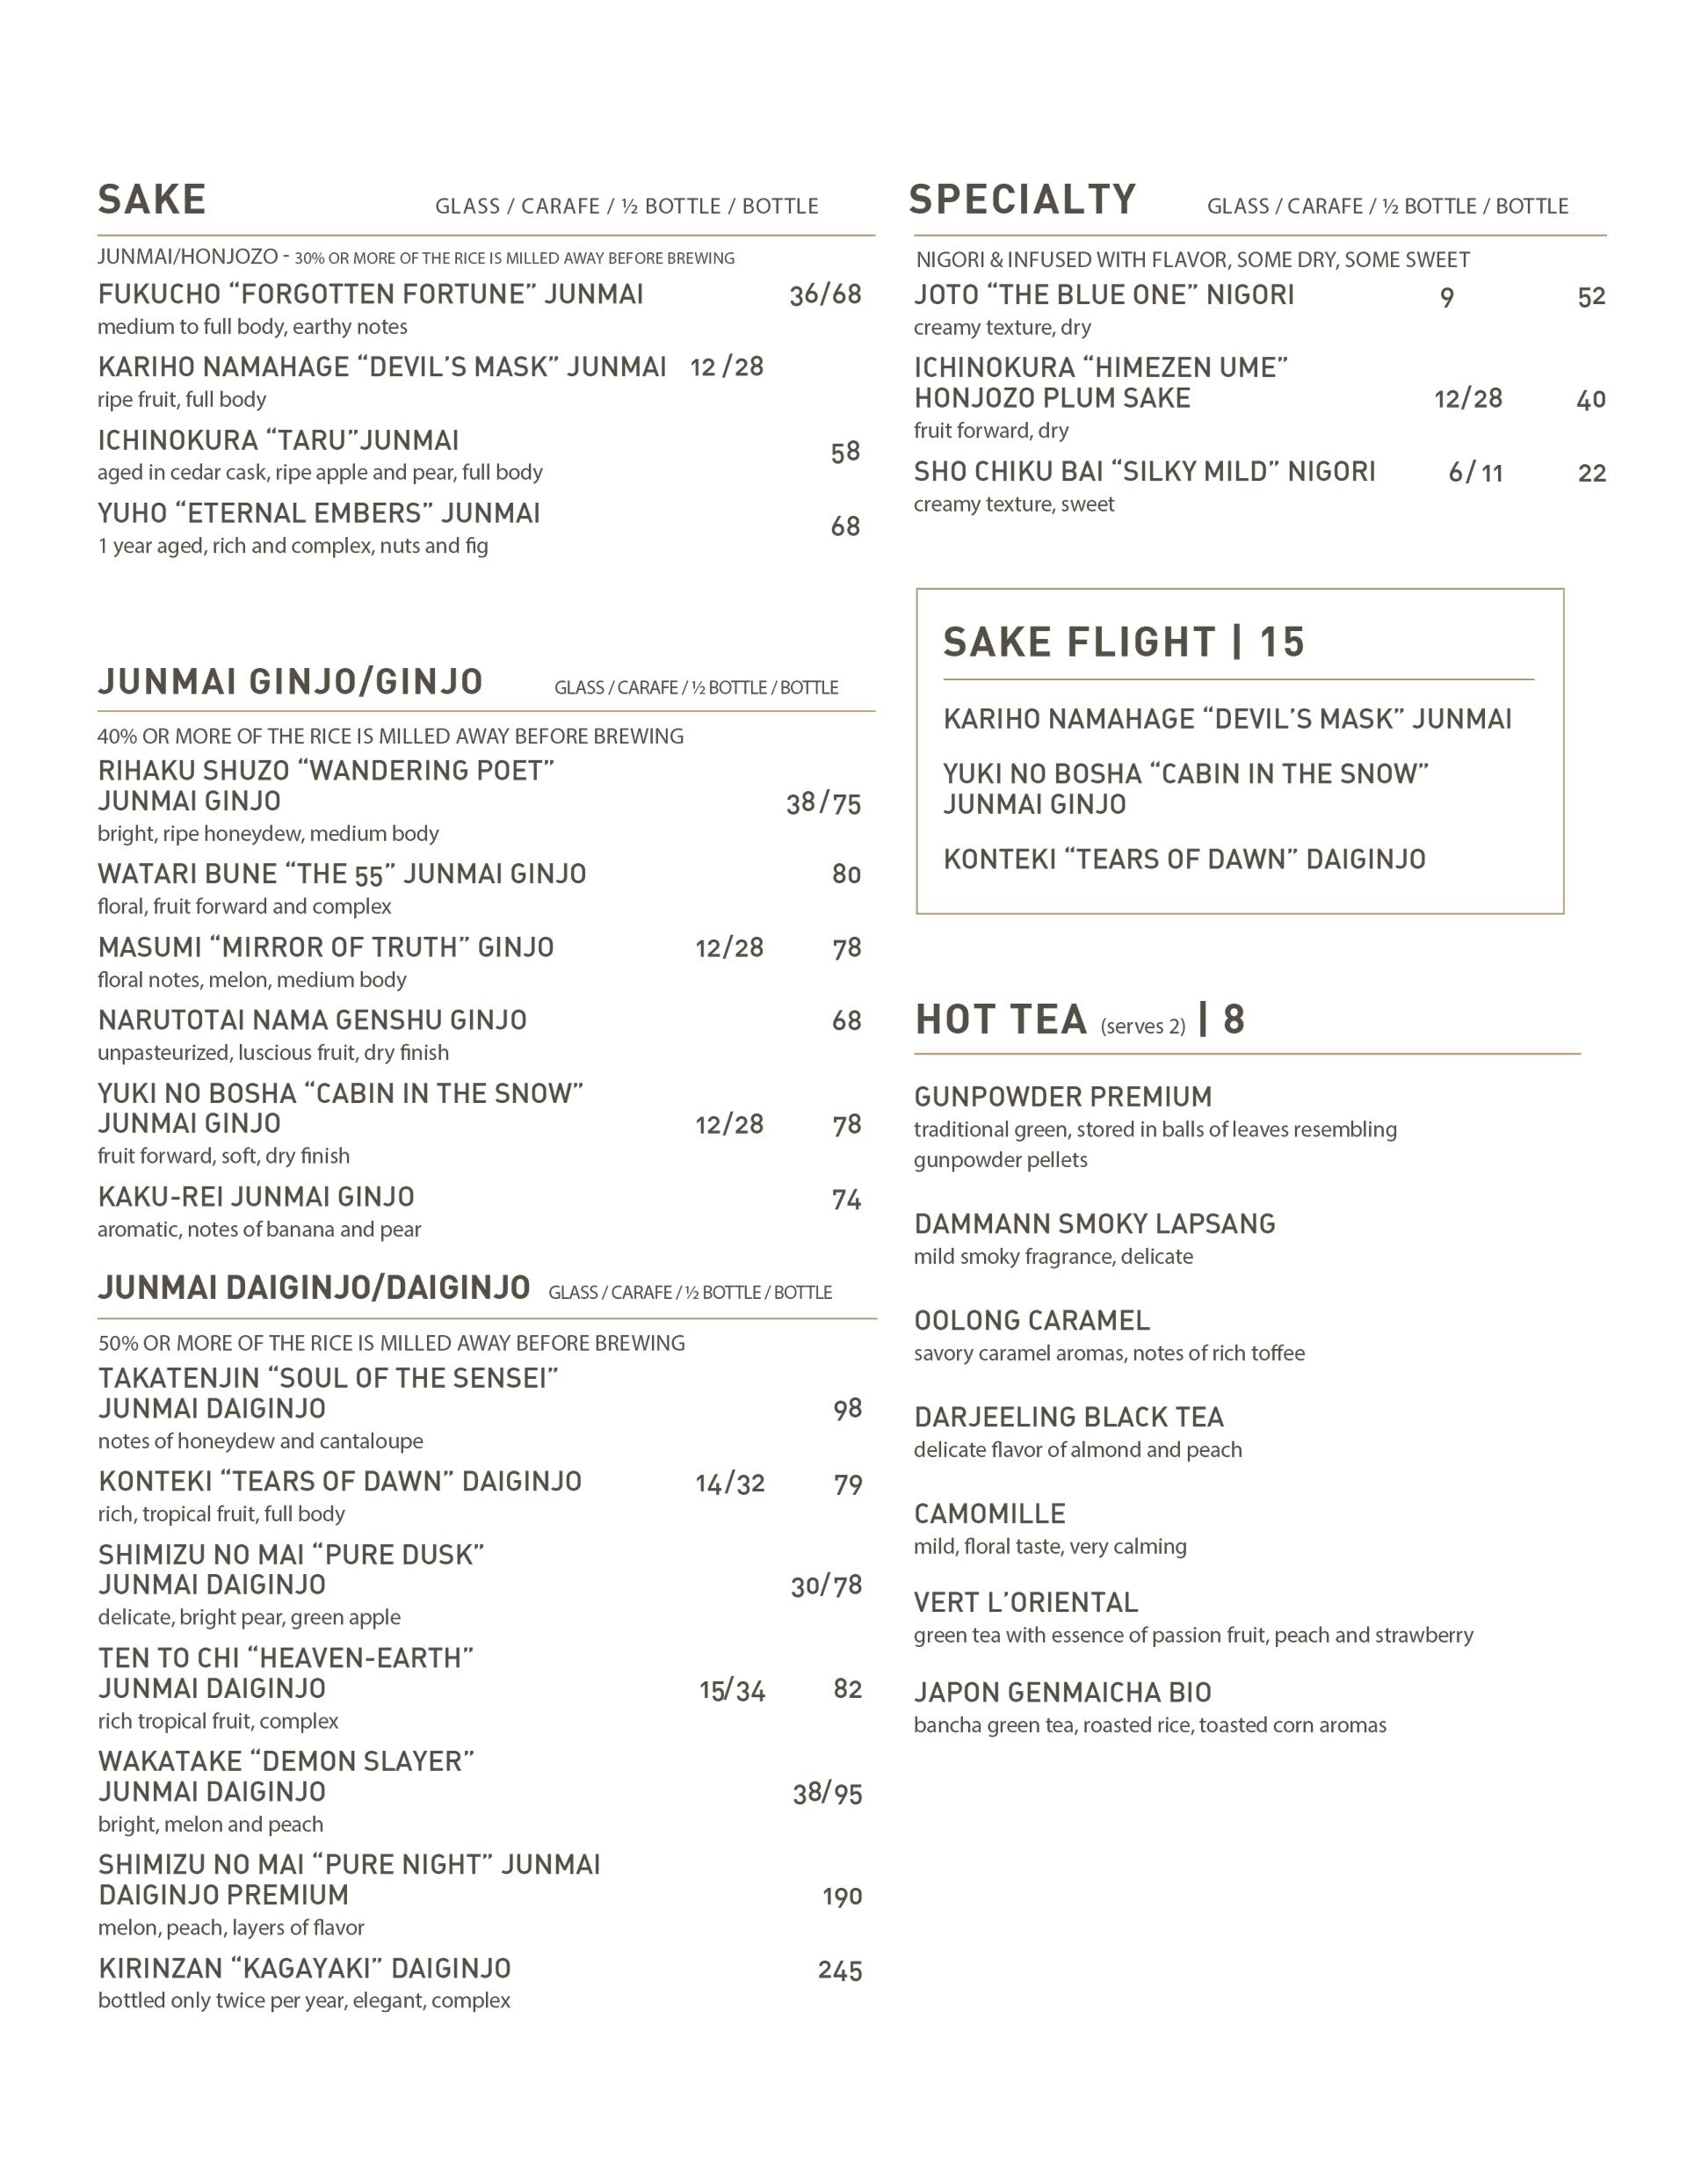 KAI-Drink-Menu-6.28.19-1.jpg